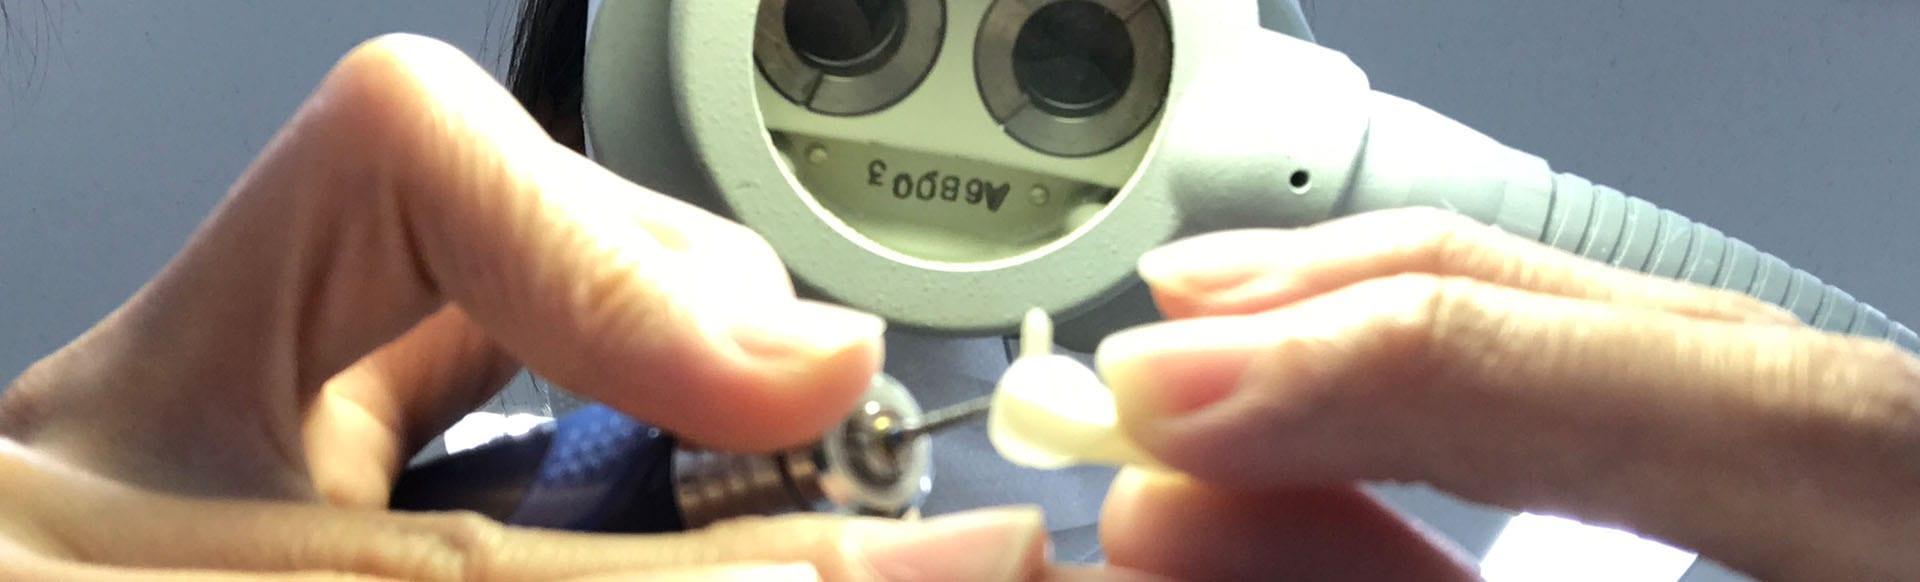 dental prosthesus